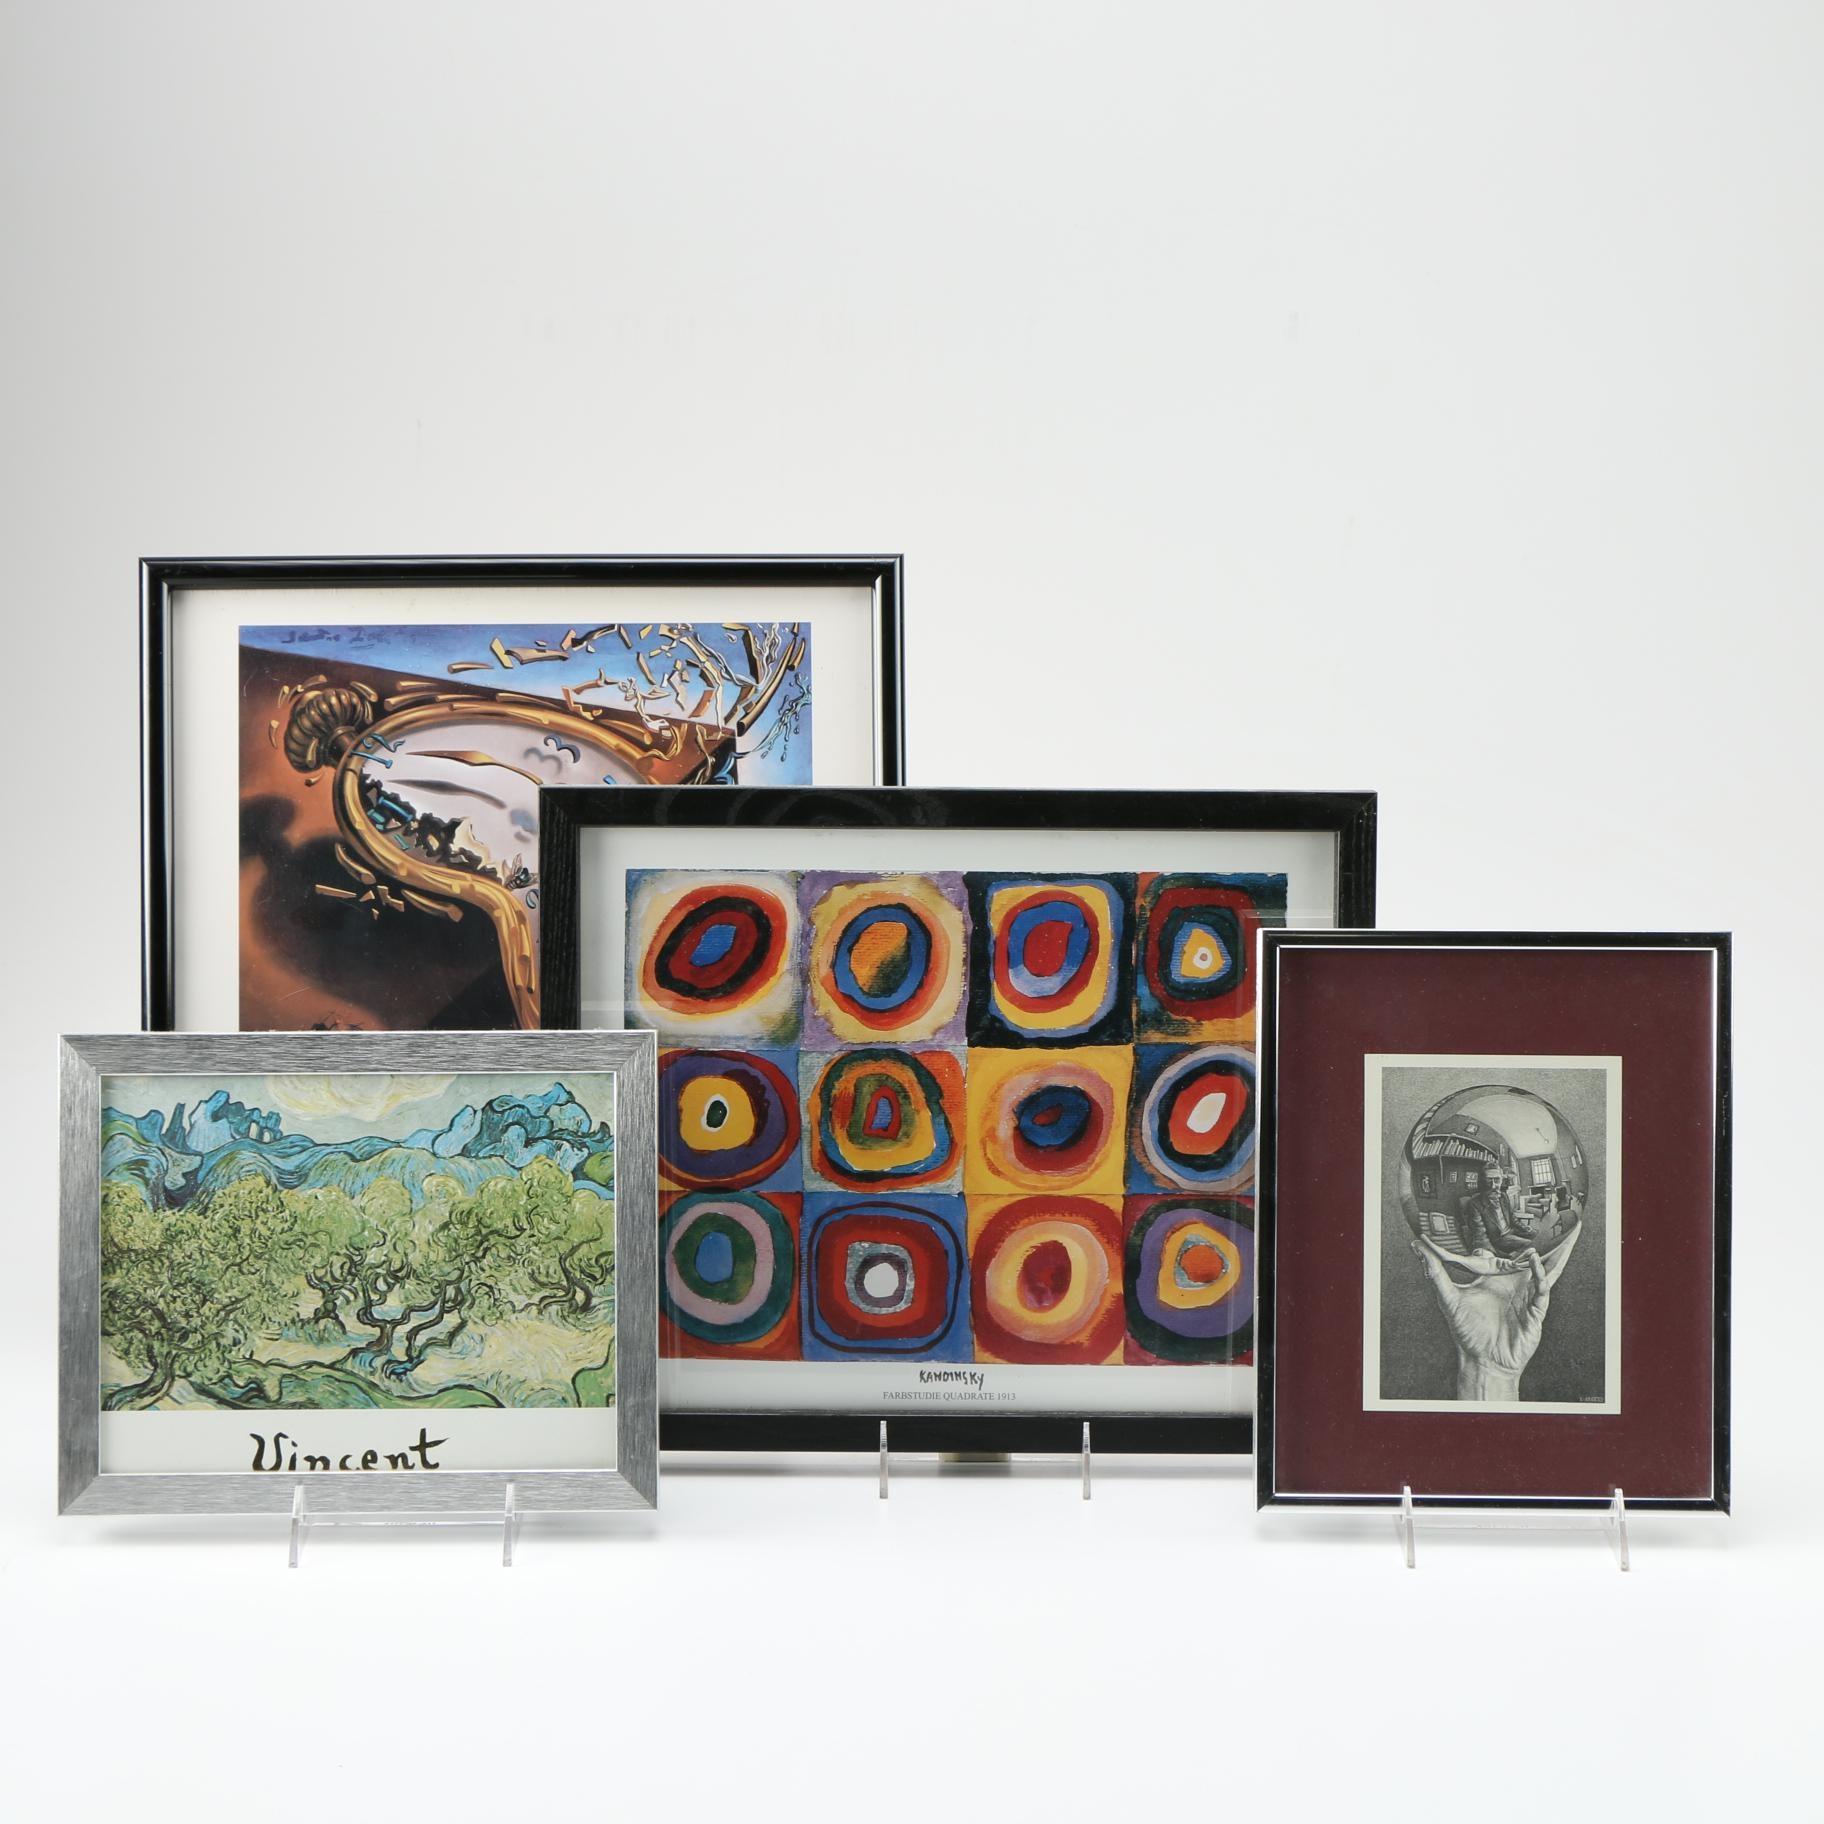 Four Offset Lithographs After Works by Van Gogh, Kandinsky, Escher and Dali